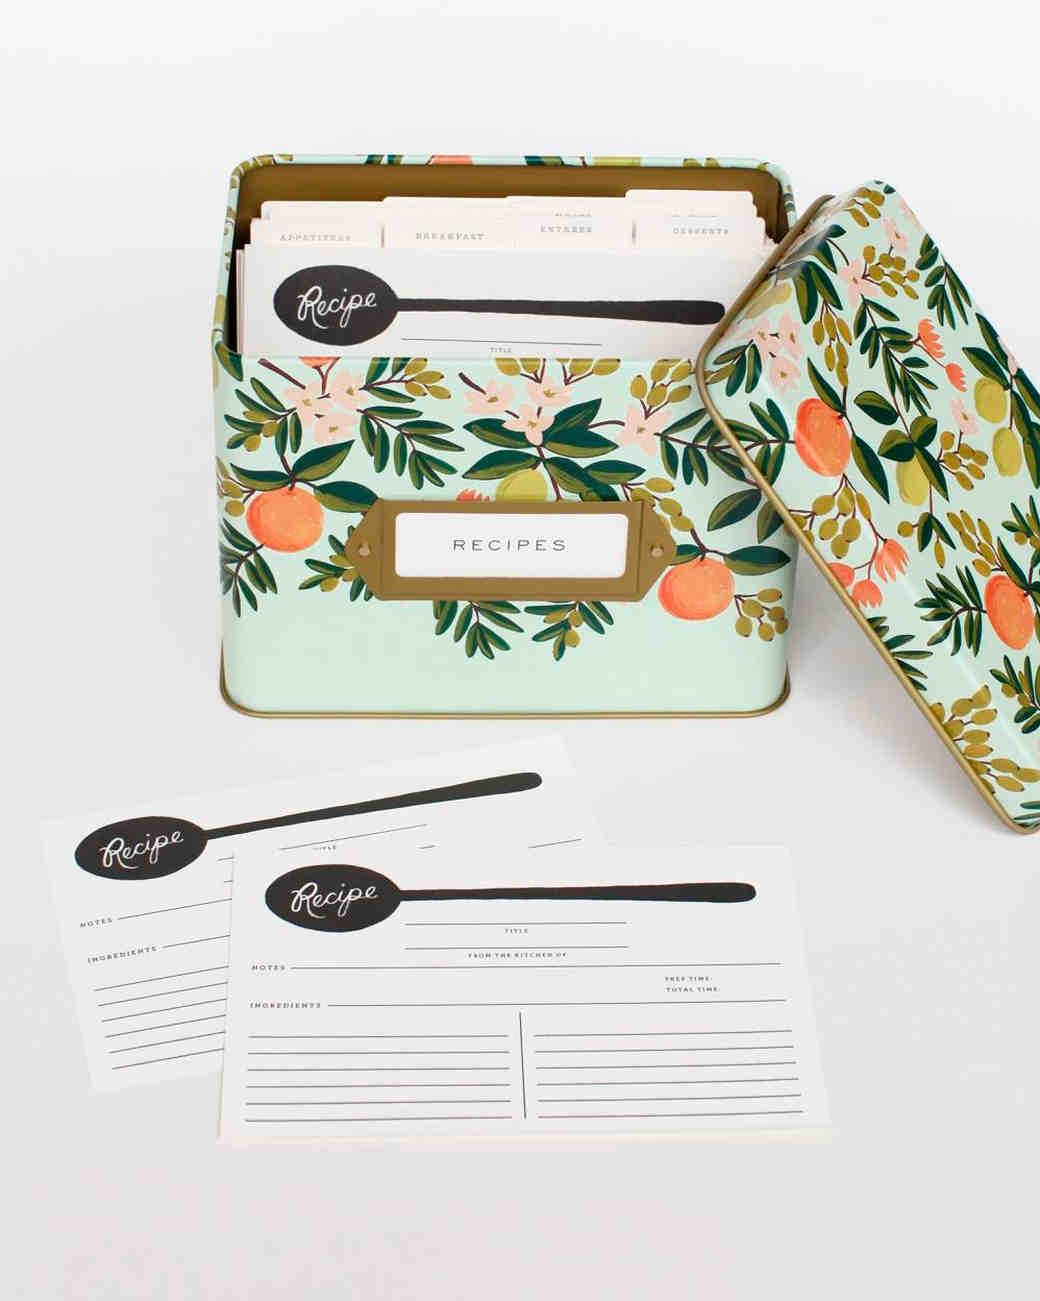 hostess-gifts-rifle-paper-co-recipe-box-1115.jpg